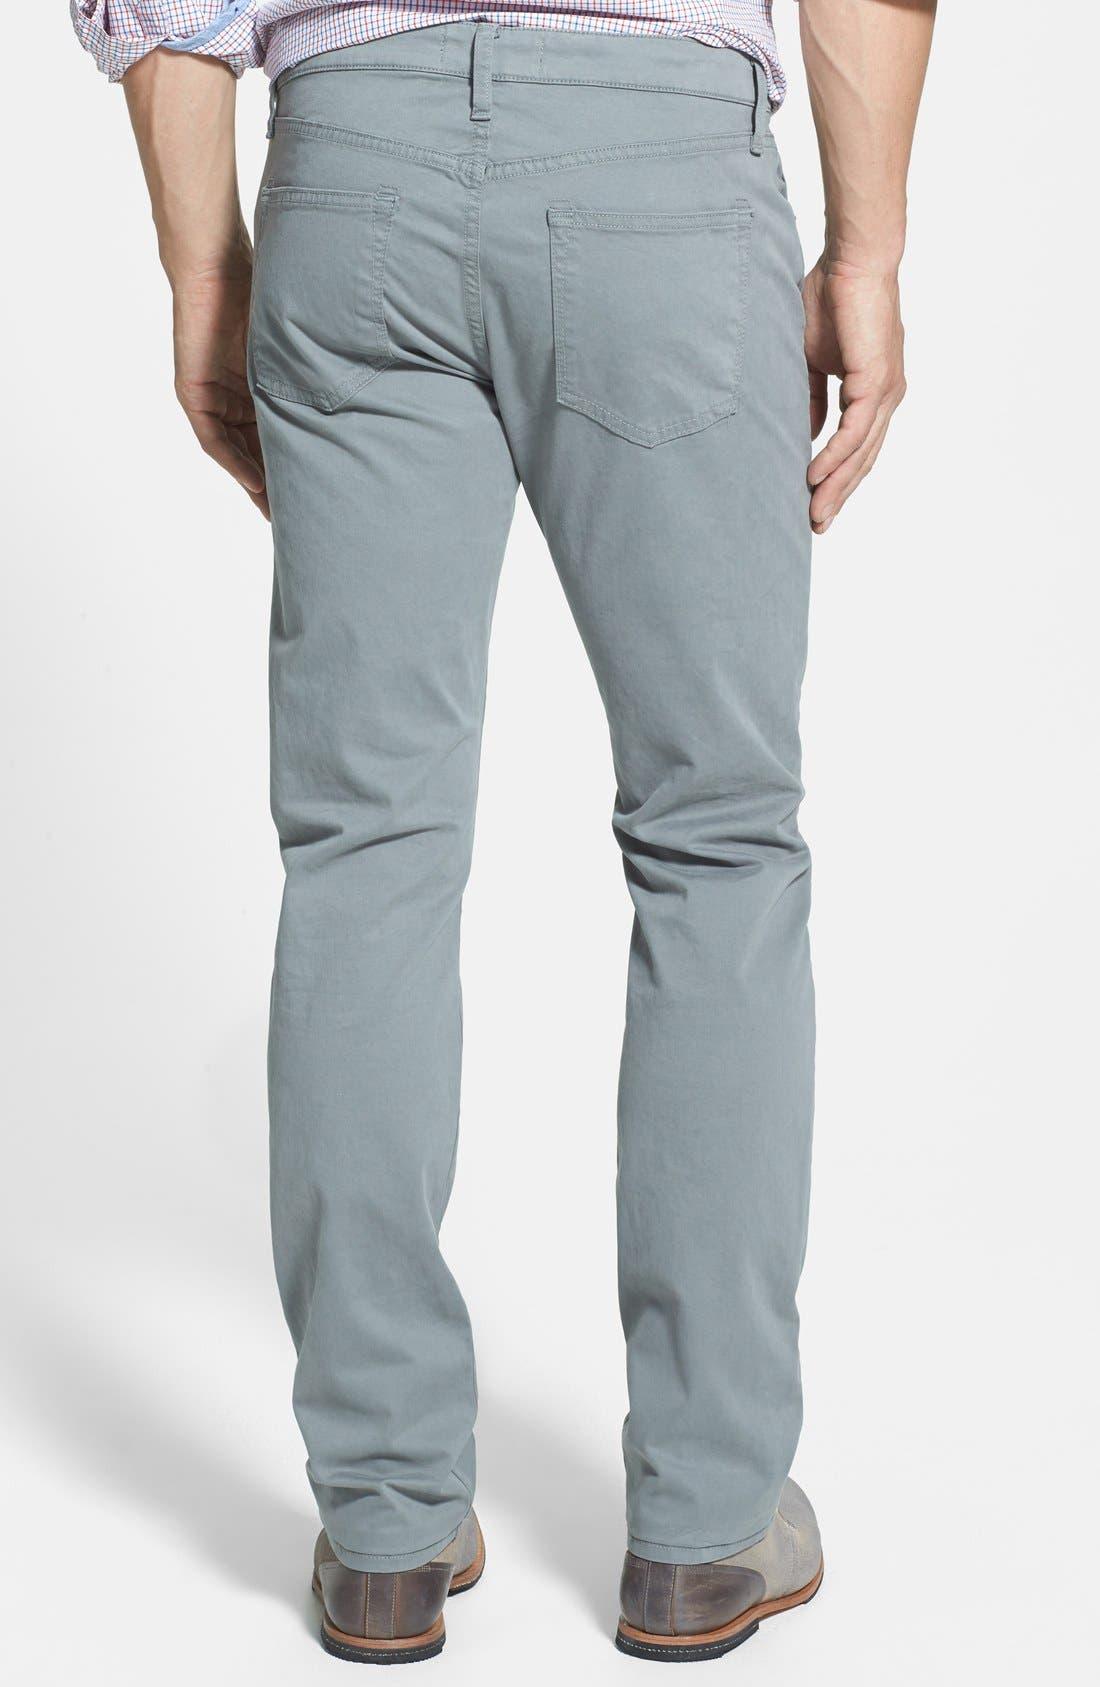 'Kane' Slim Fit Cotton Twill Pants,                             Alternate thumbnail 28, color,